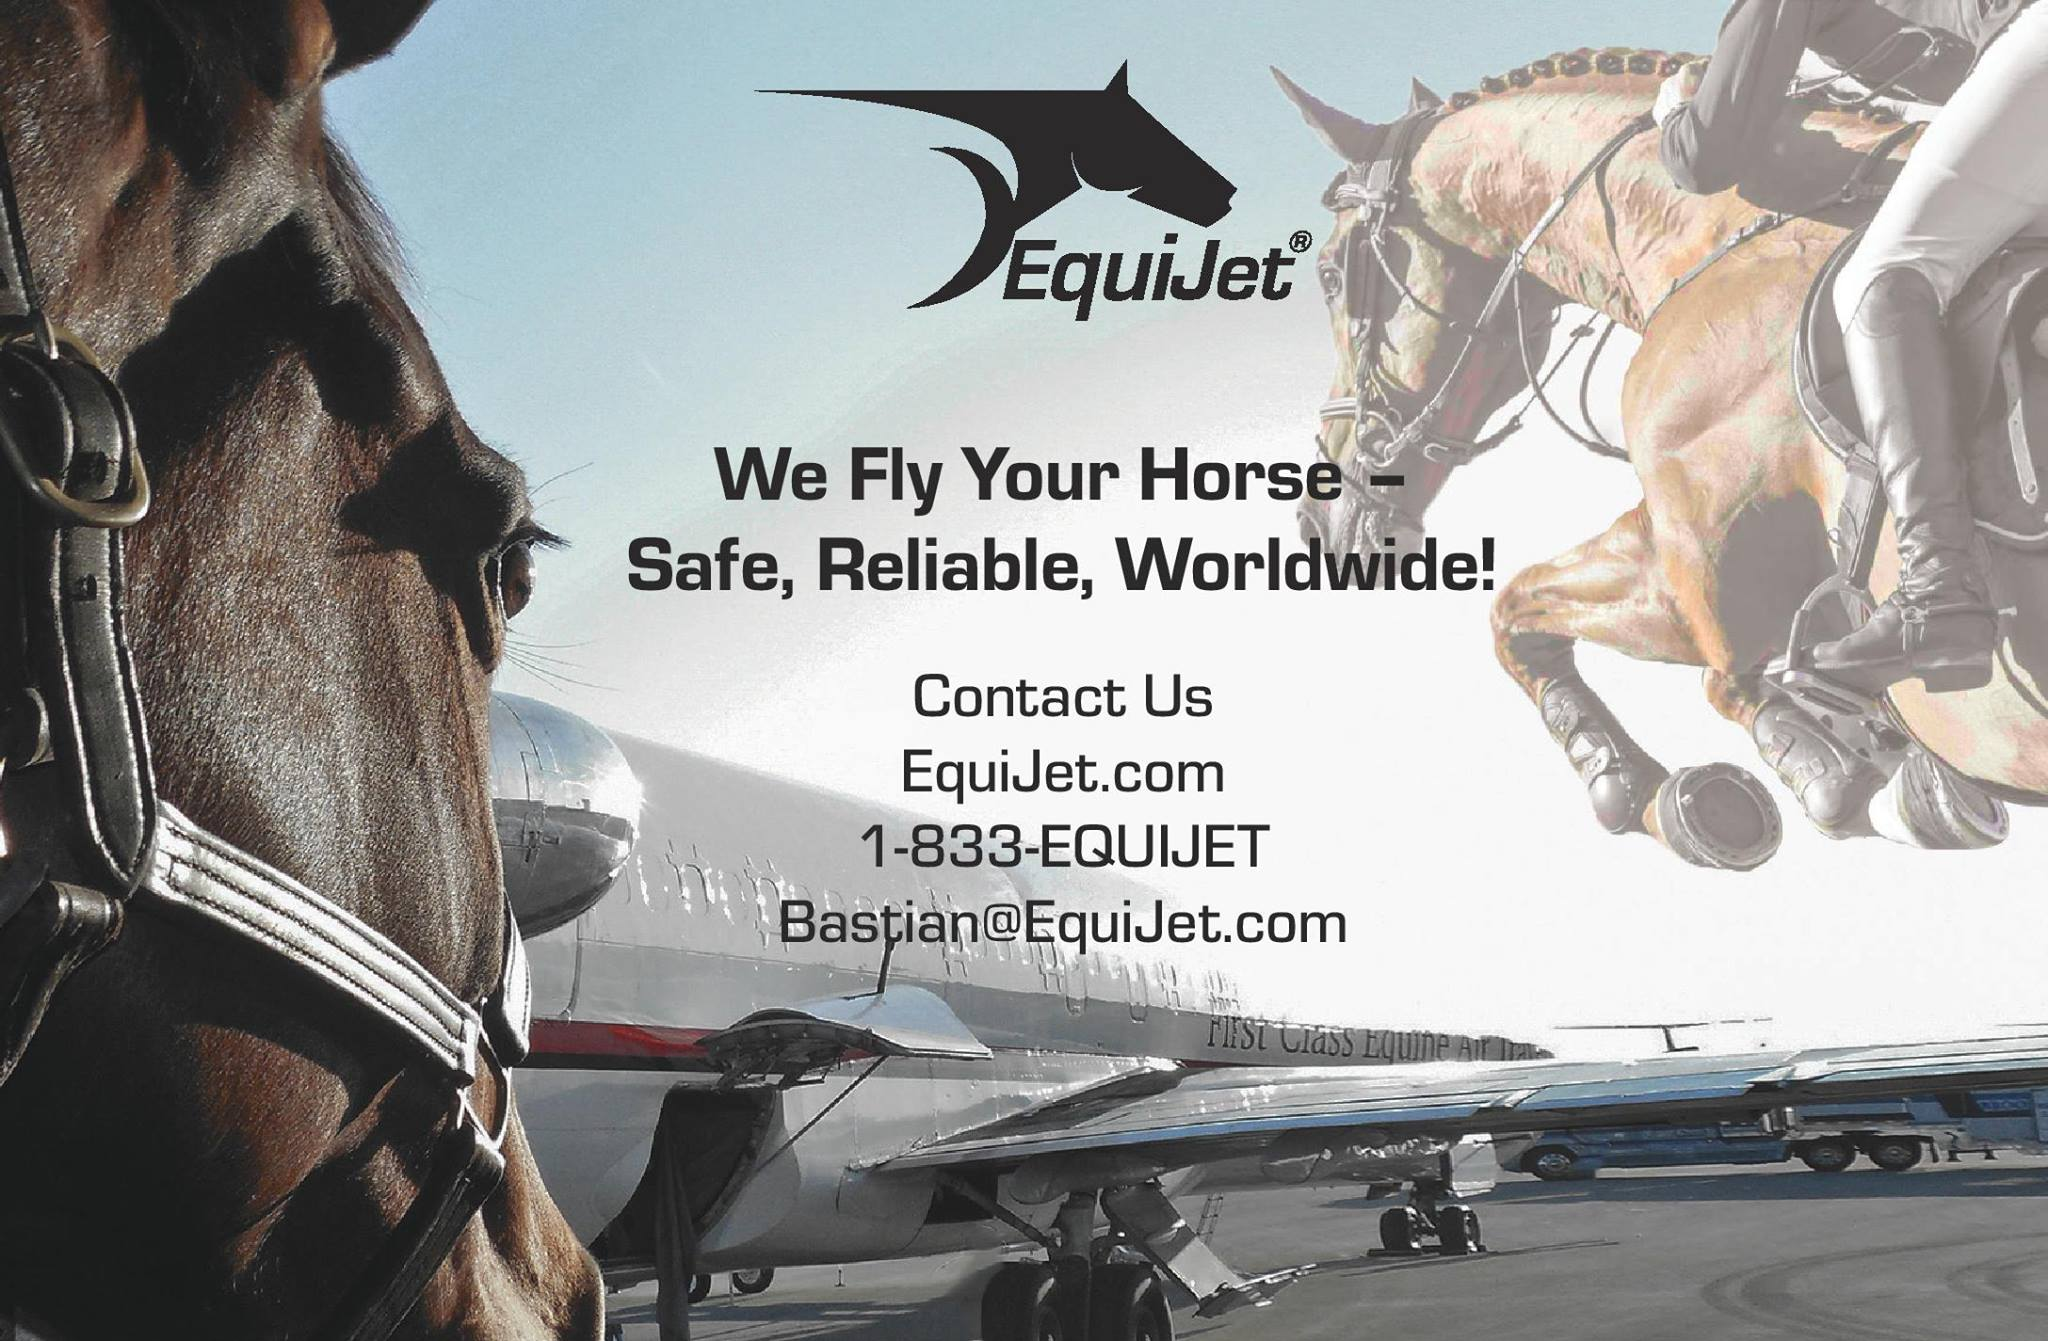 EquiJet_promotional graphic.jpg